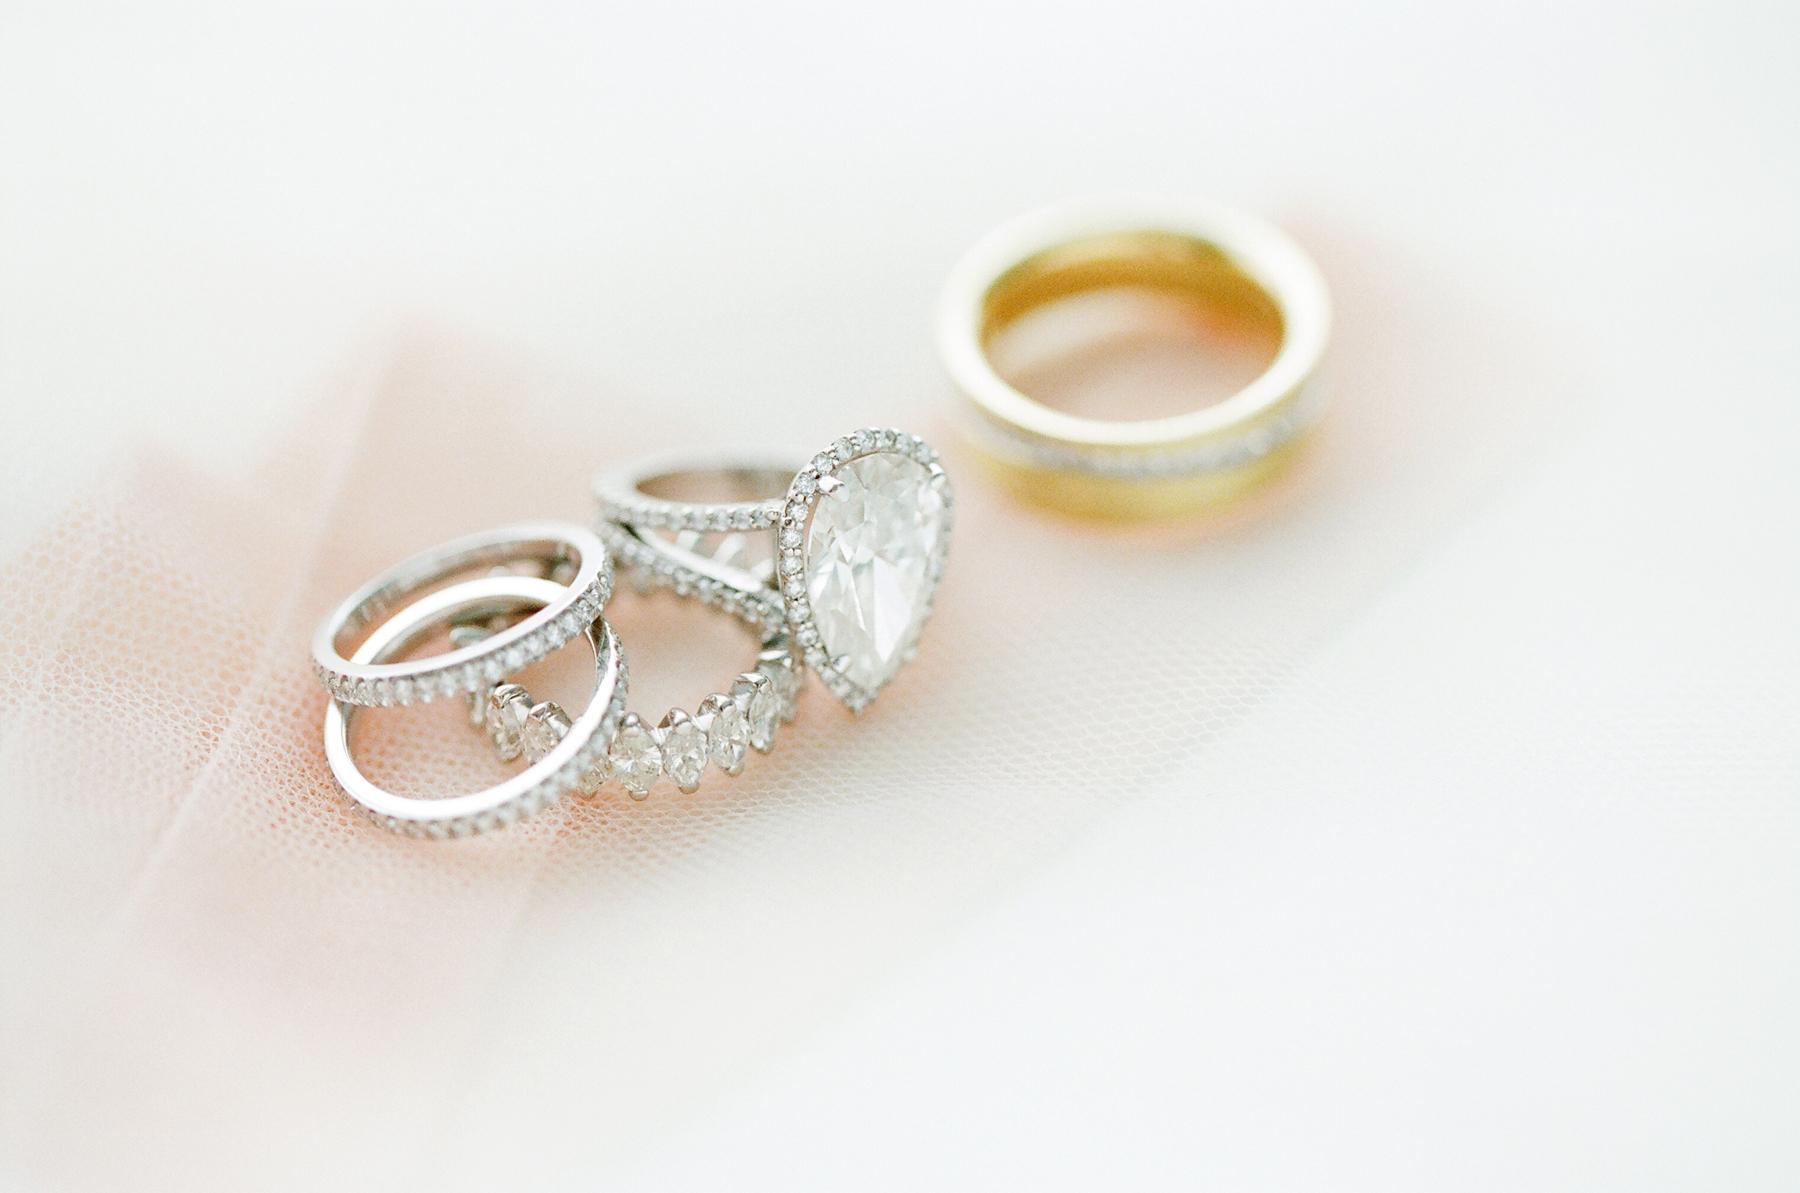 Adrienne bailon engagement ring inspiration pear shaped halo diamond